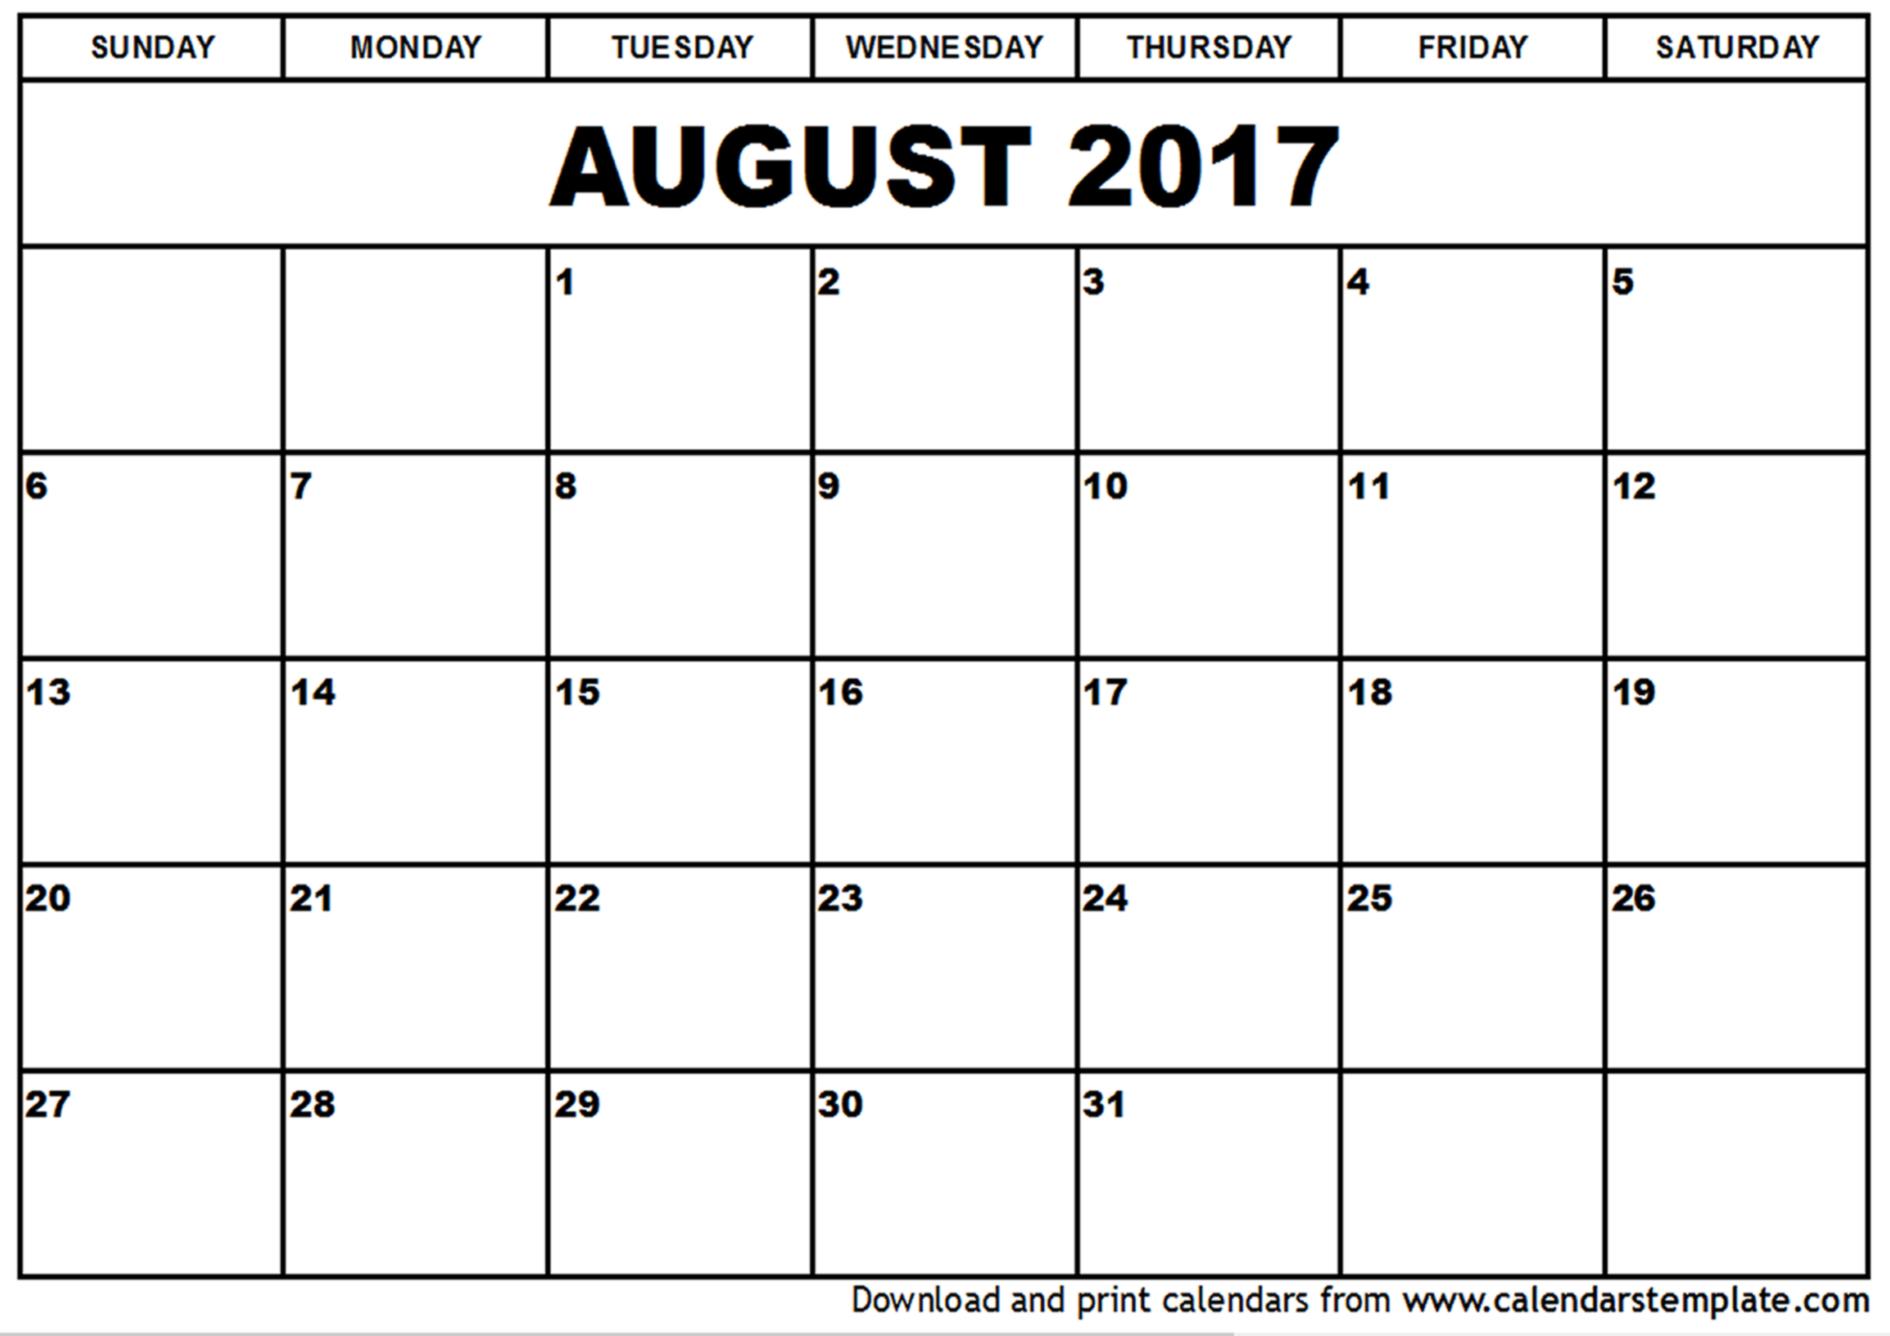 Calendar 2017: 50 Important Calendar Templates of 2017 [PDF, JPG]